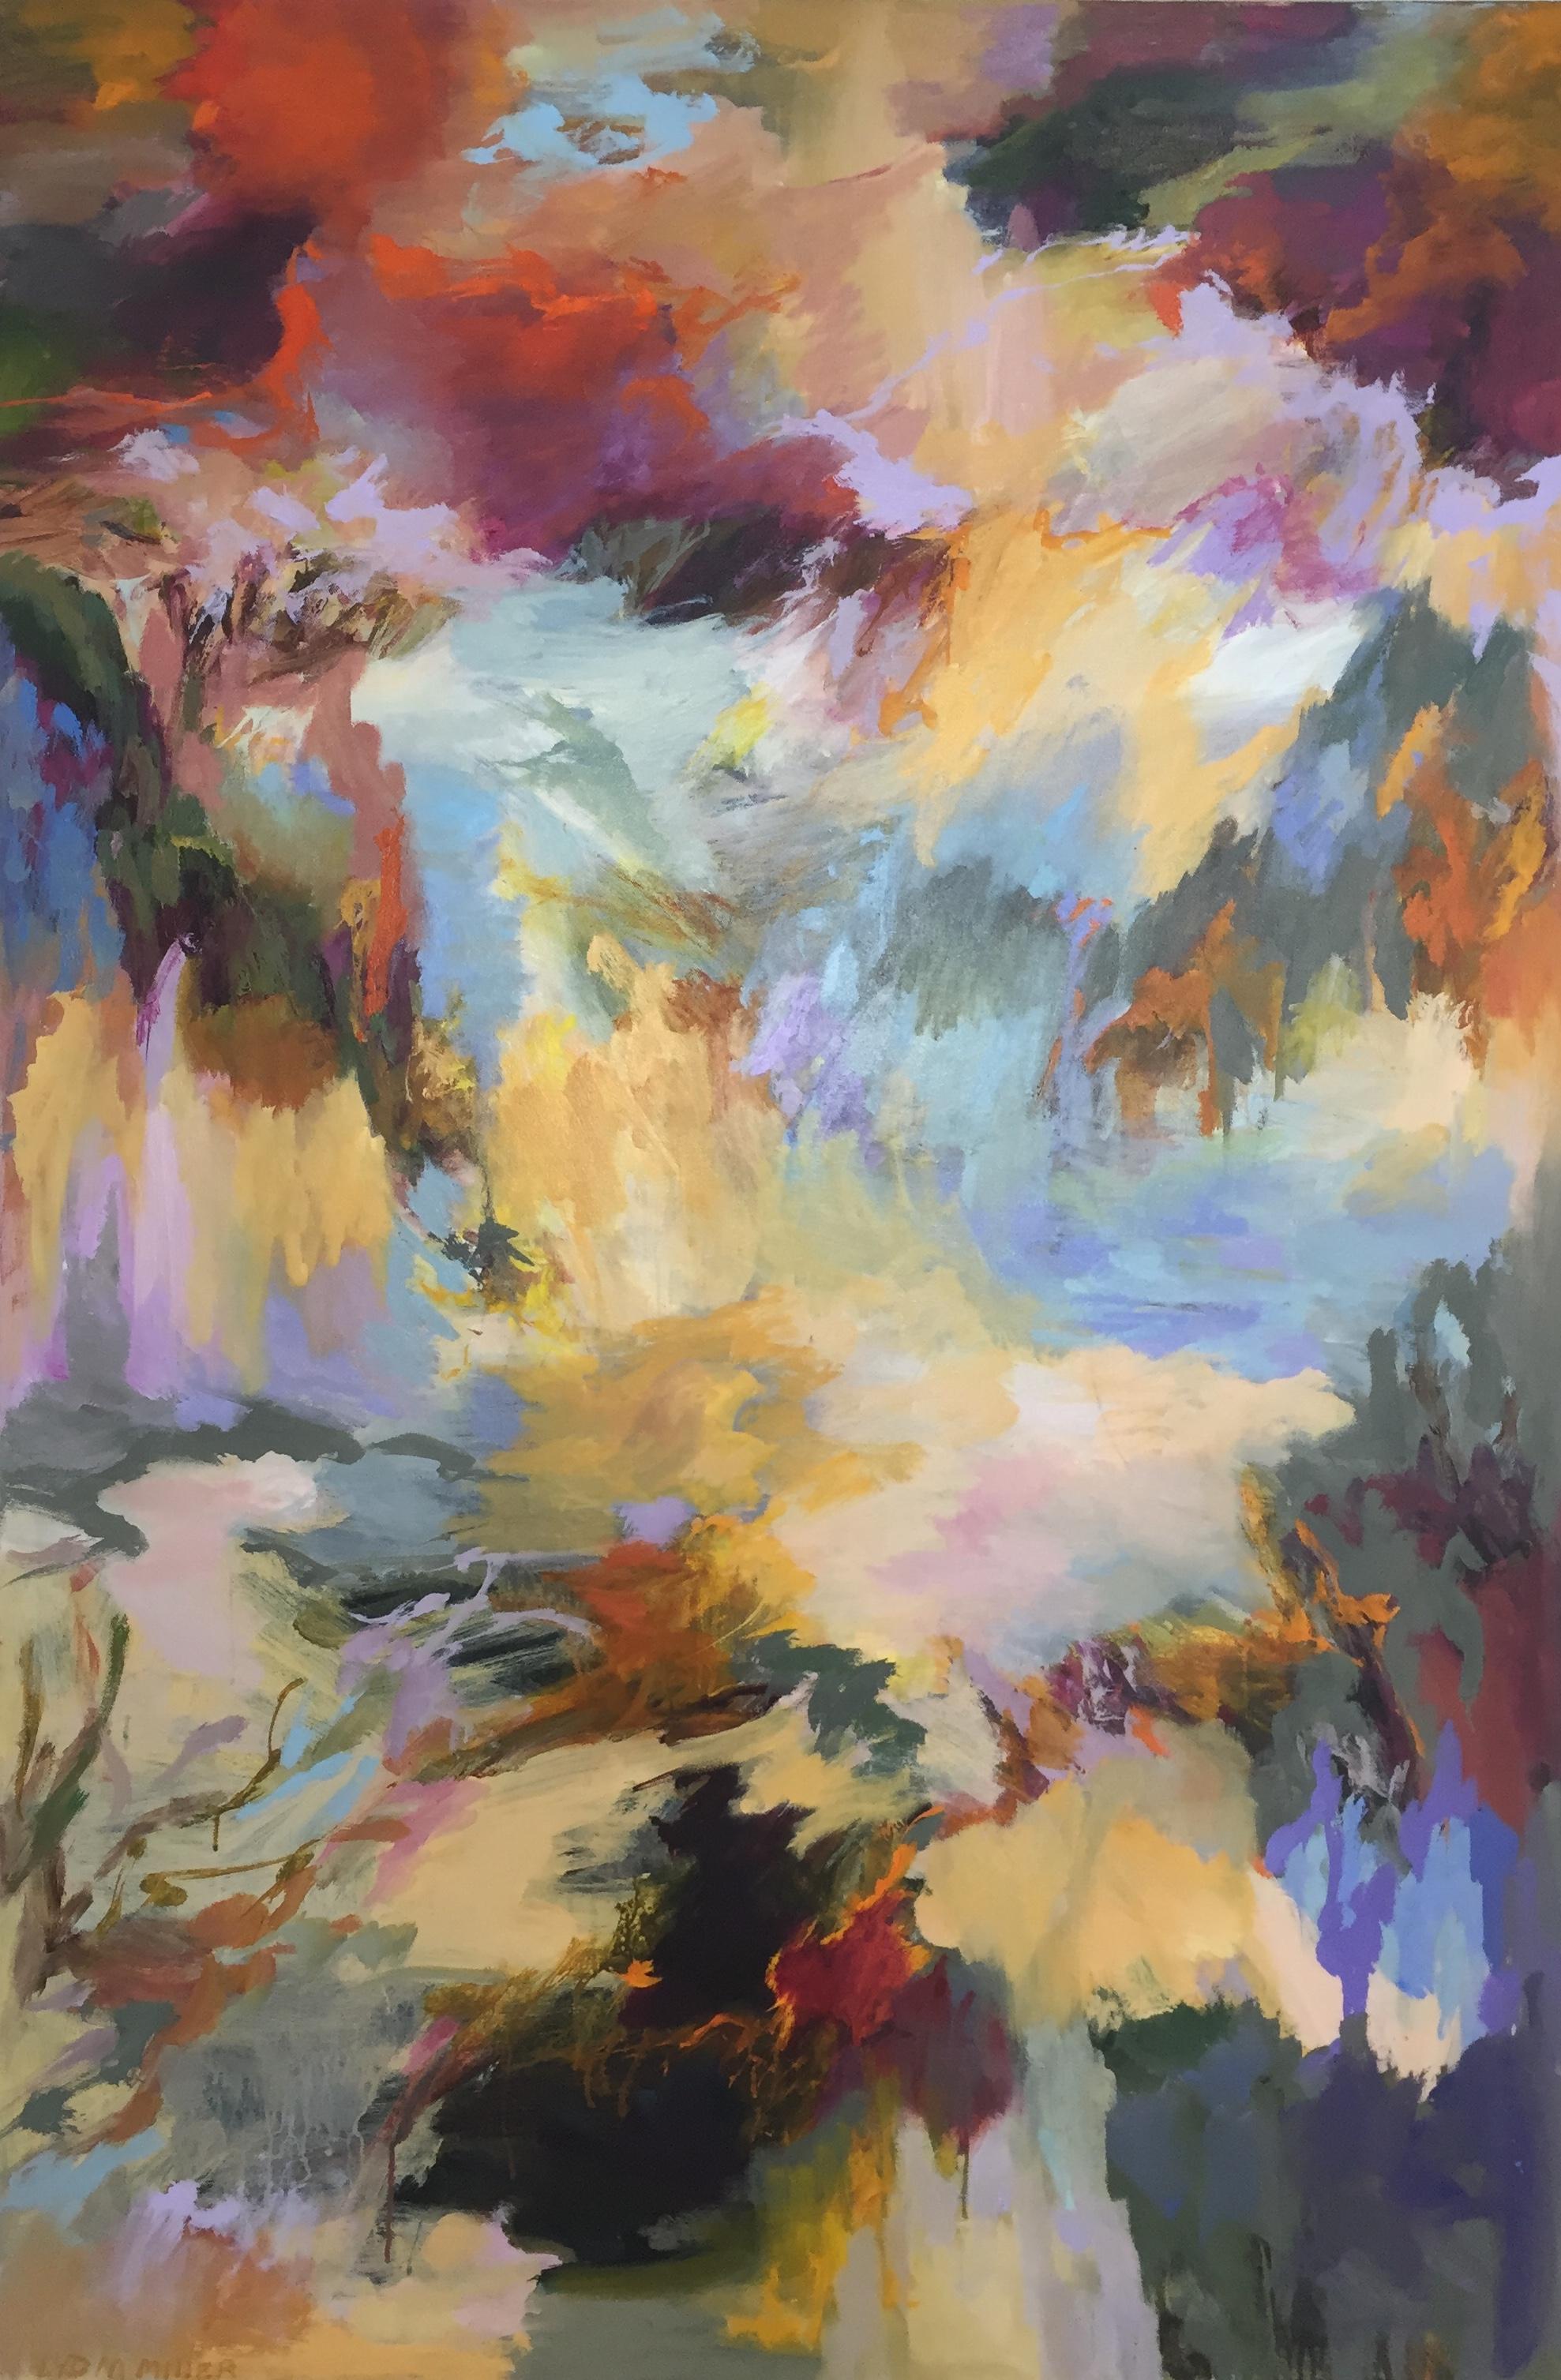 Lydia Miller  Vivre  2018 oil on canvas 152 x 102cm $4500.00